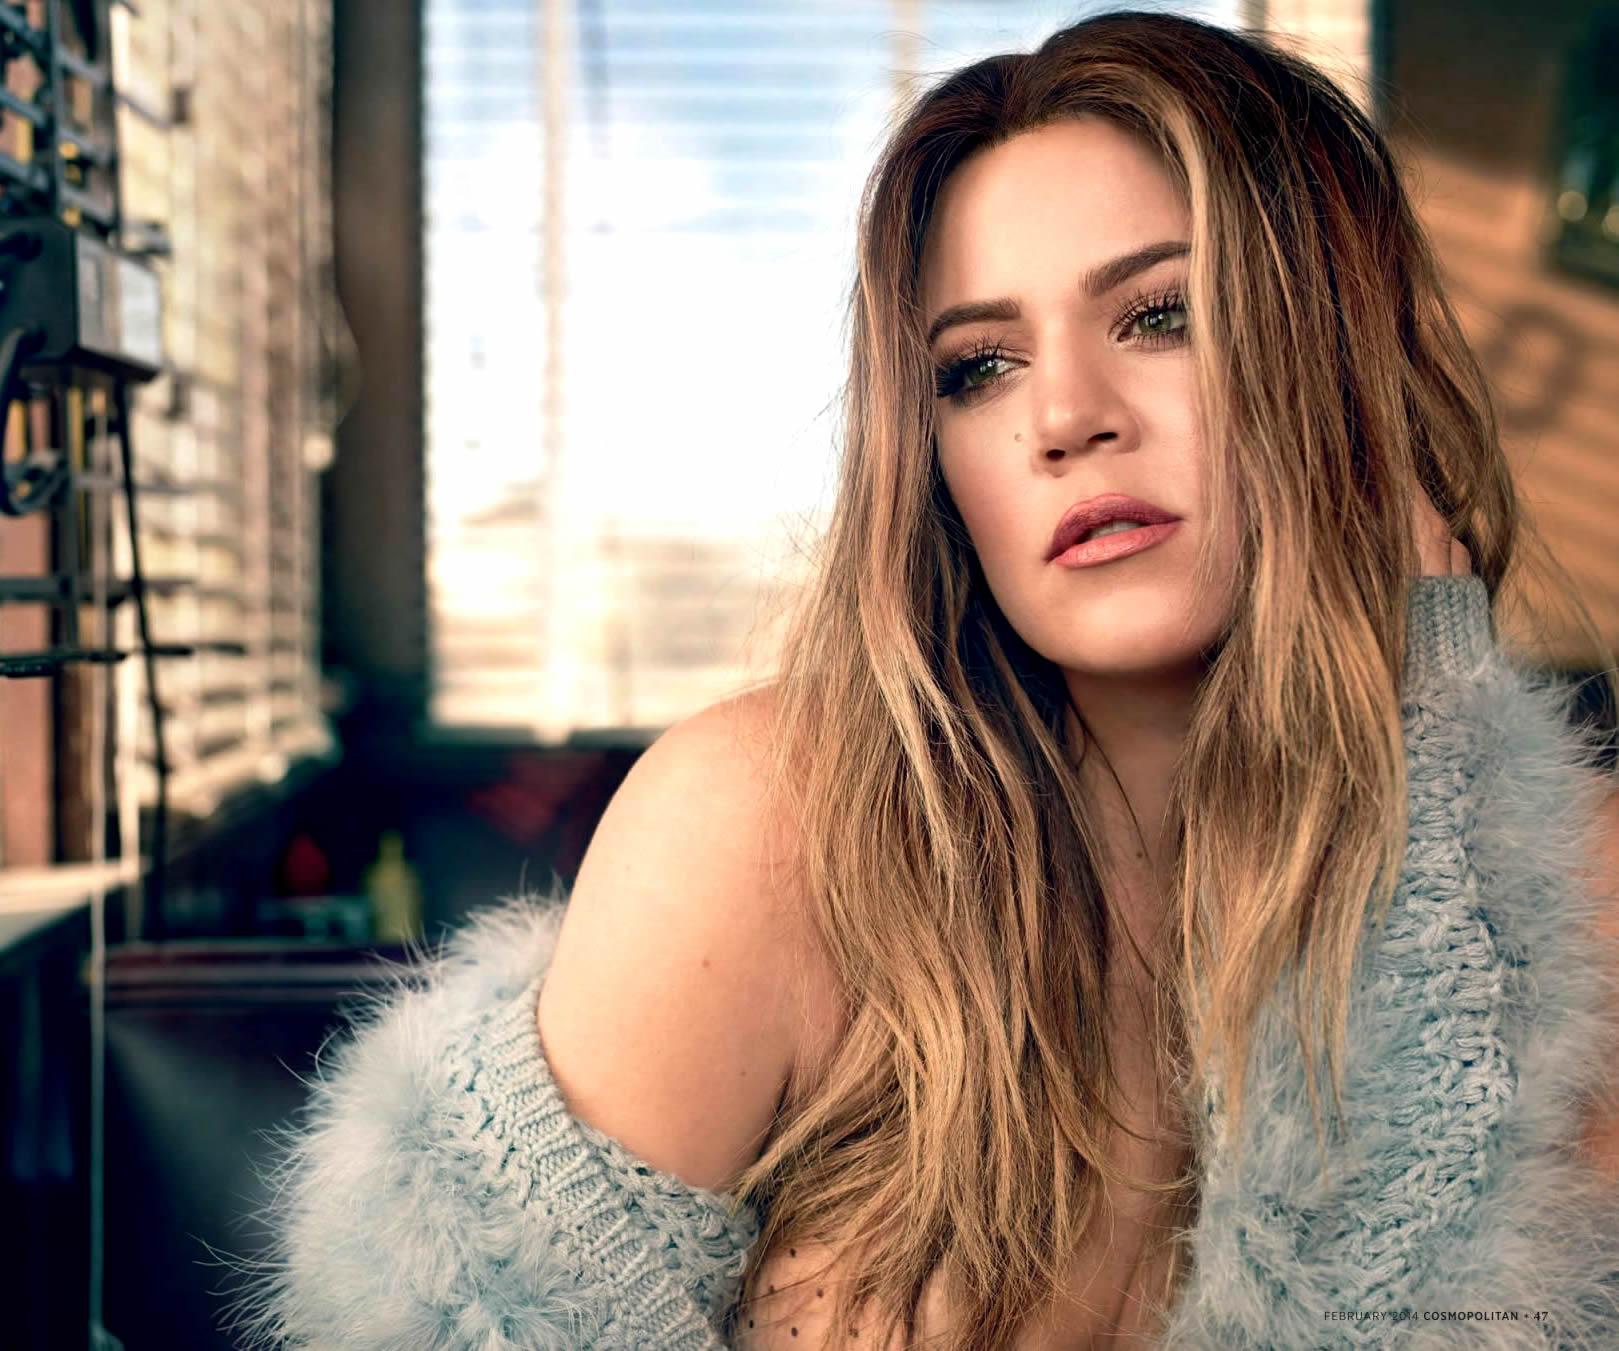 Style Stalk: Khloe Kardashian's New Look is Actually Inspiring - Kadia ...